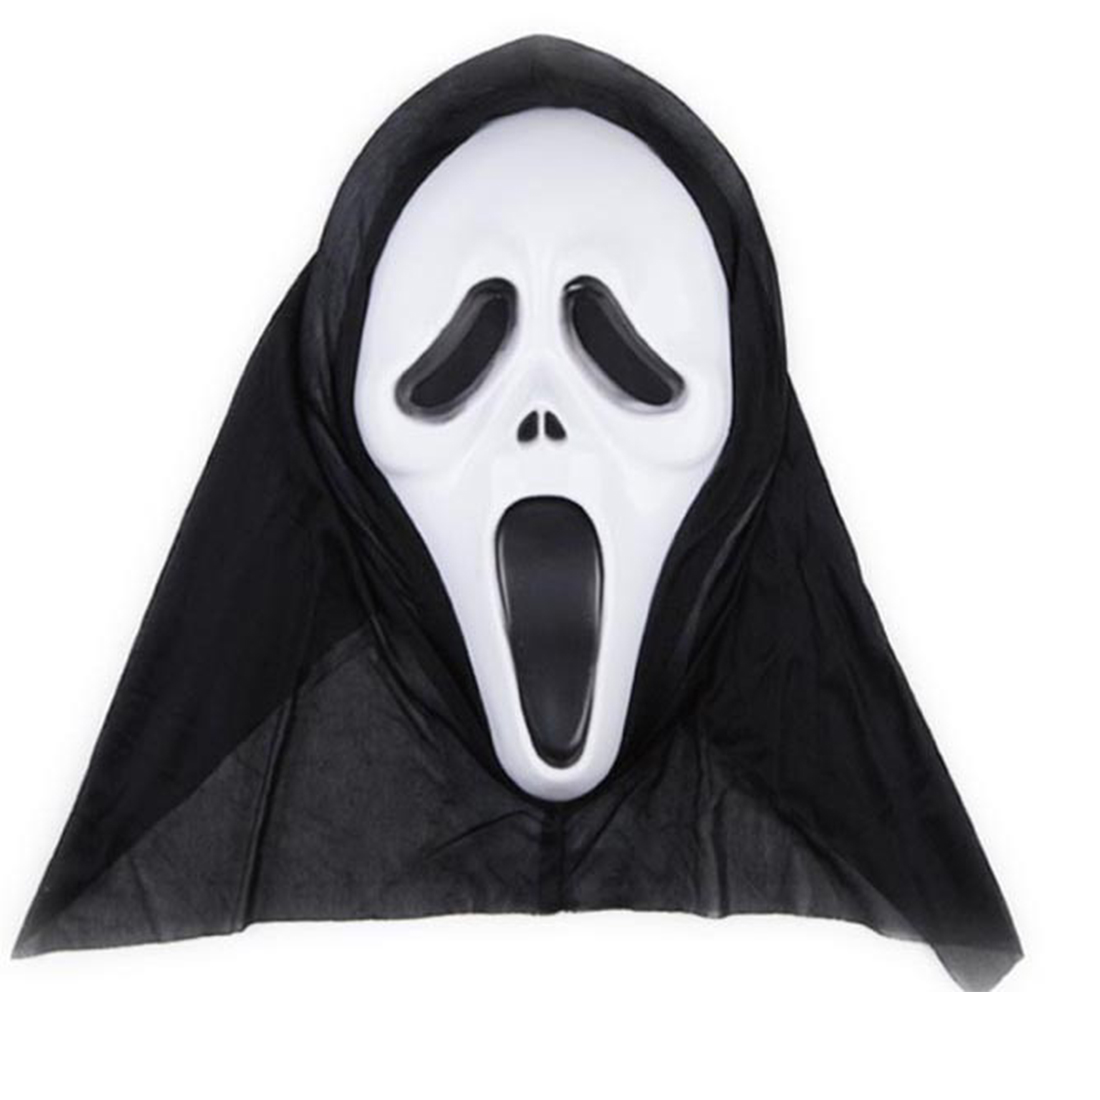 Aliexpress.com : Buy Funny 1Pc Scary Ghost Face Scream Mask Creepy ...